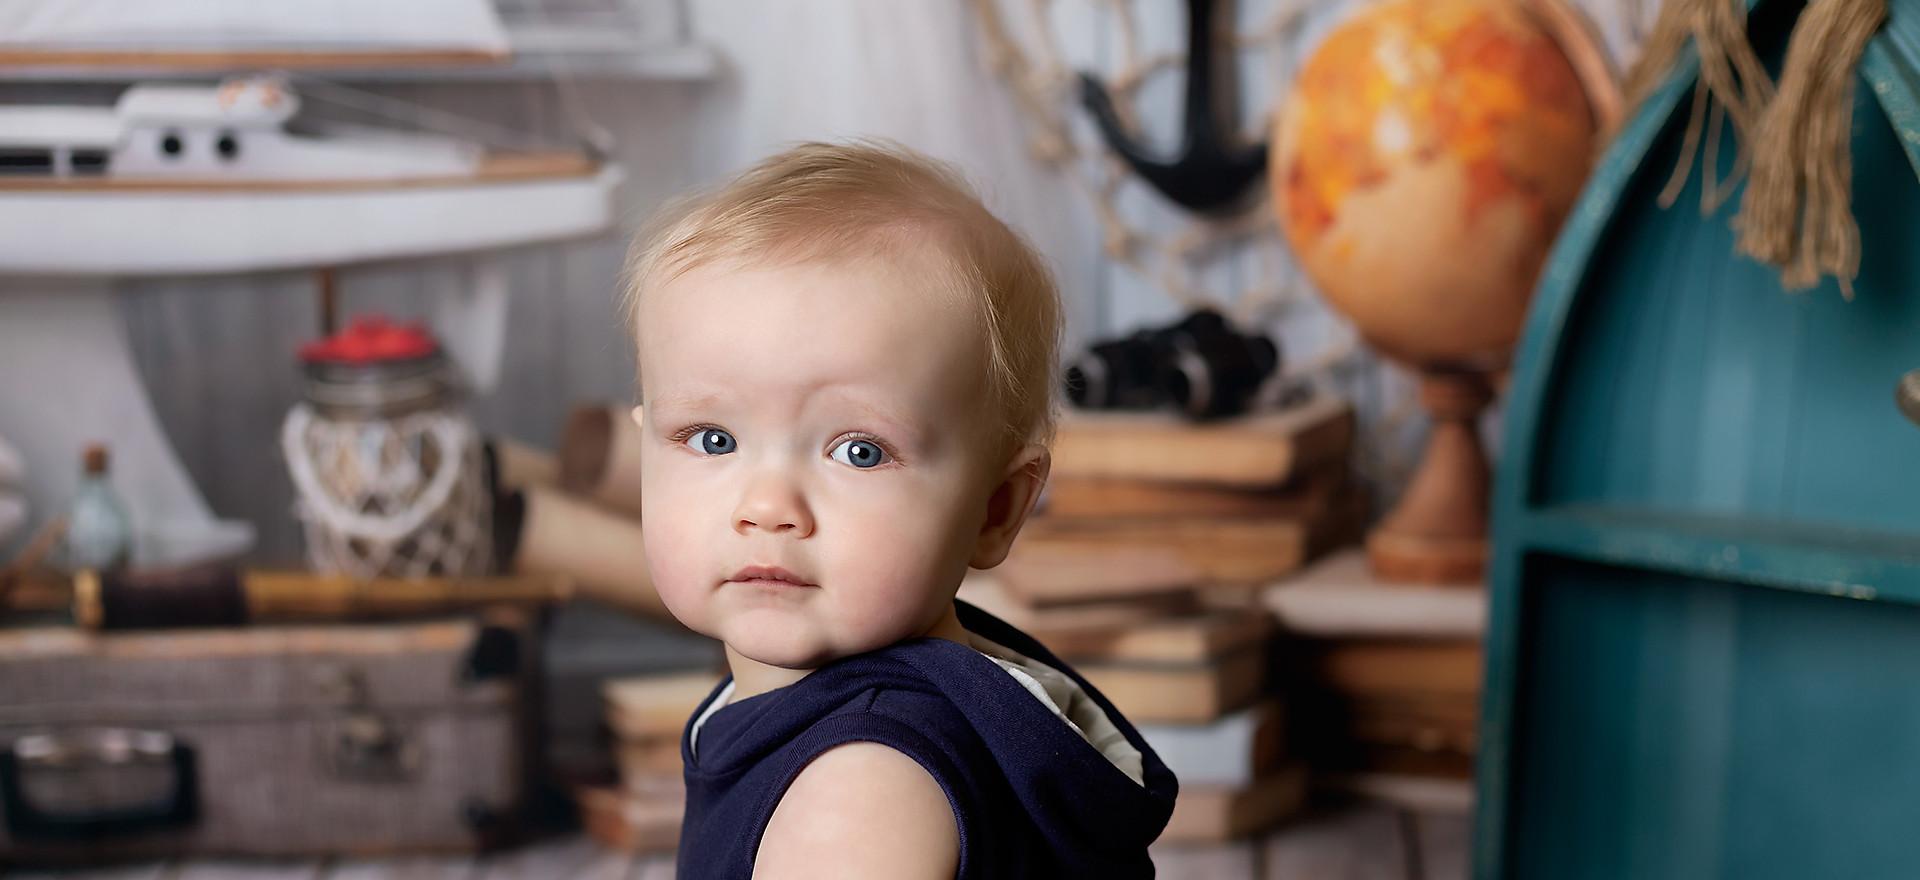 Pullman WA baby photographer